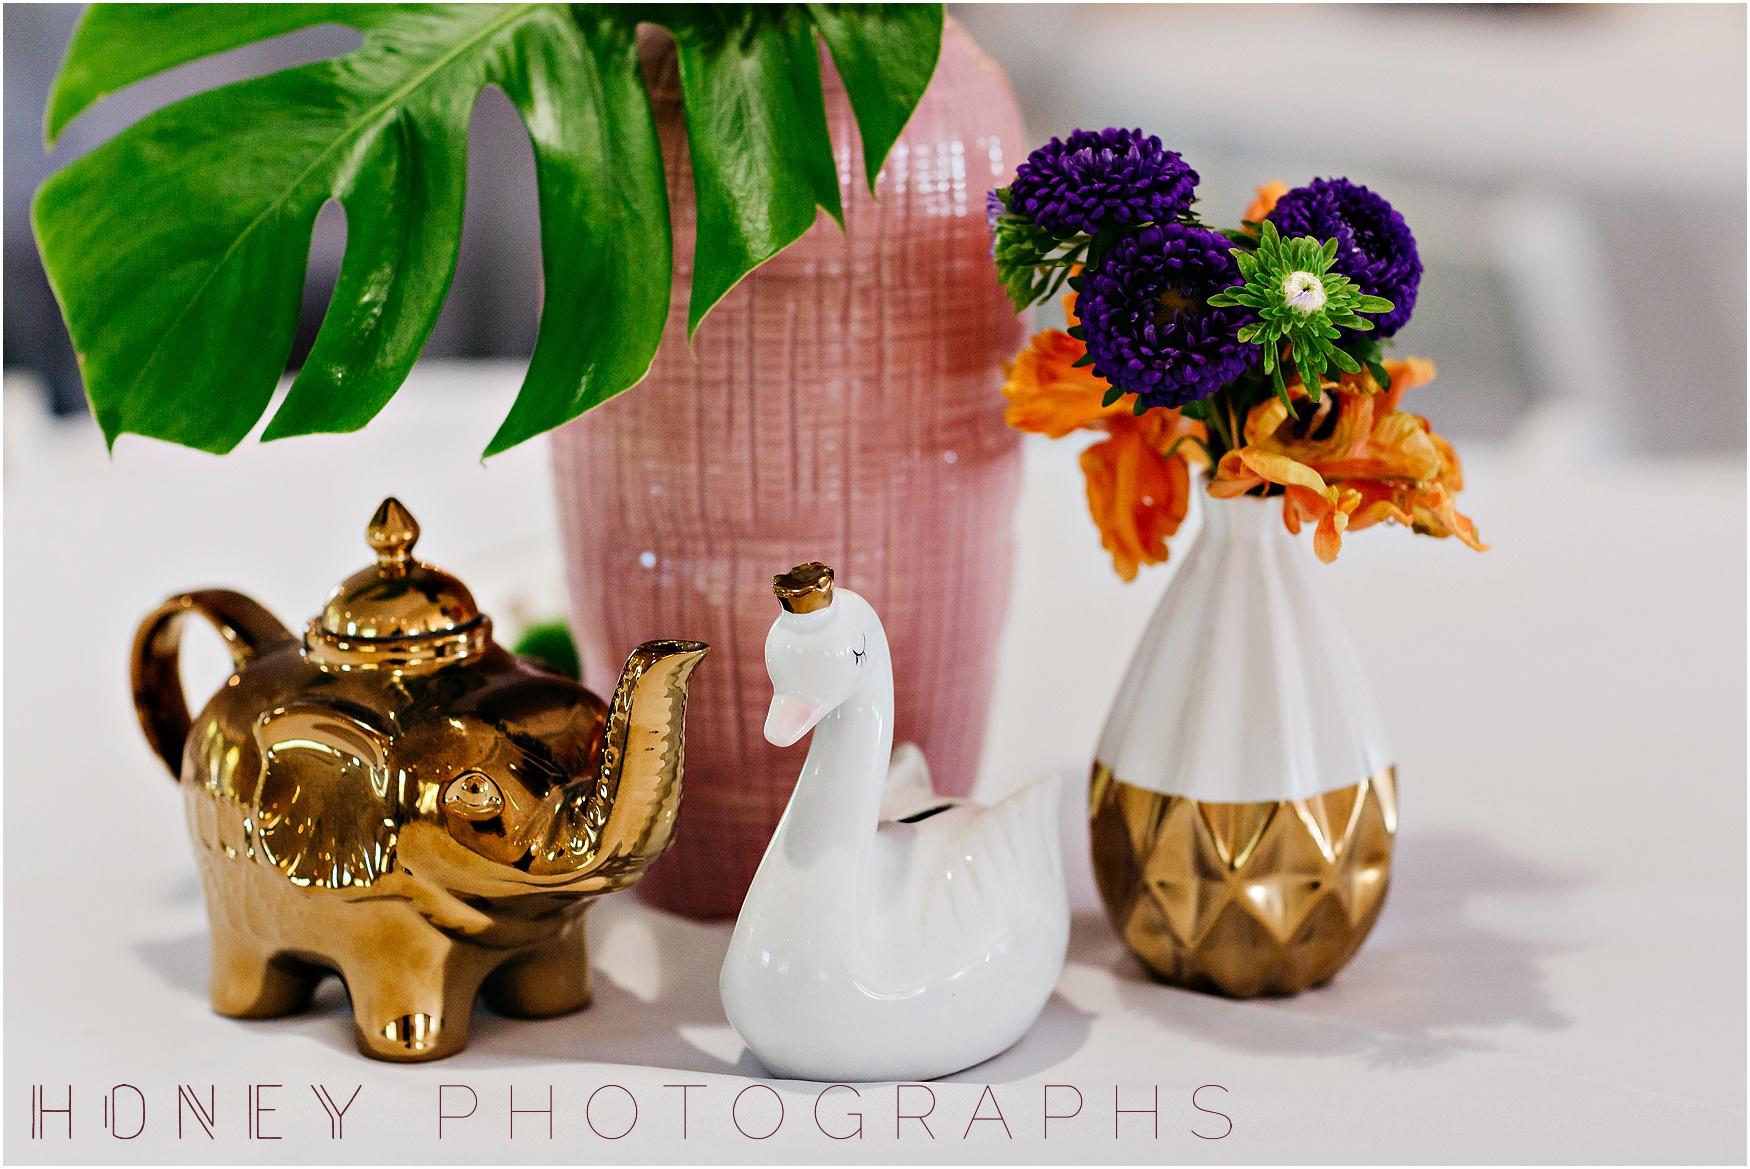 colorful_ecclectic_vibrant_vista_rainbow_quirky_wedding041.jpg